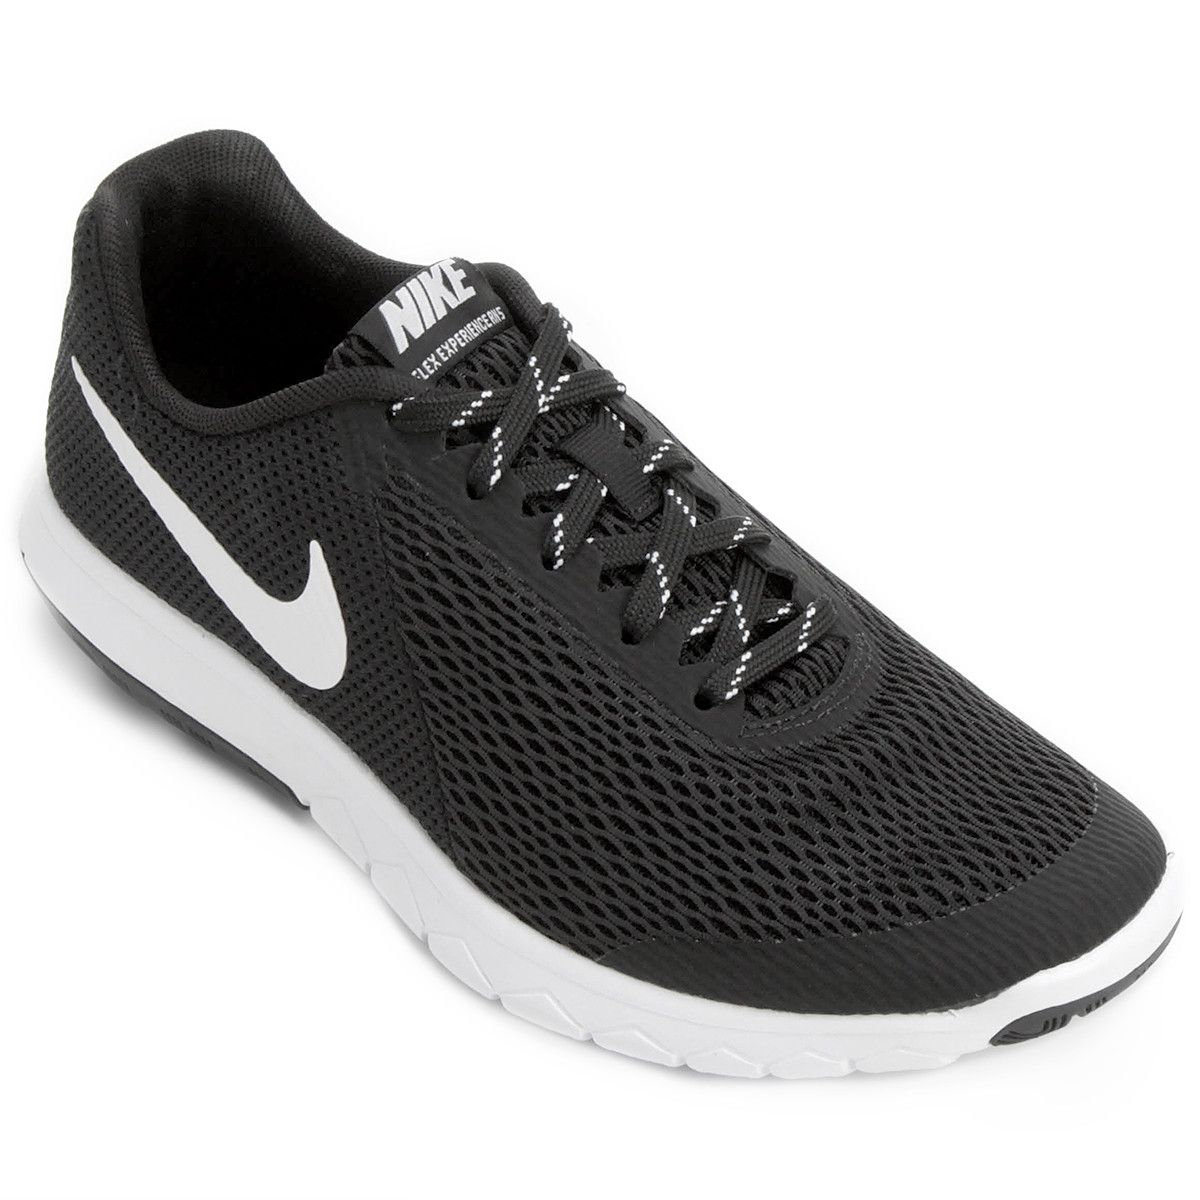 Tênis Nike Flex Experience Rn 5 Feminino Preto E Branco